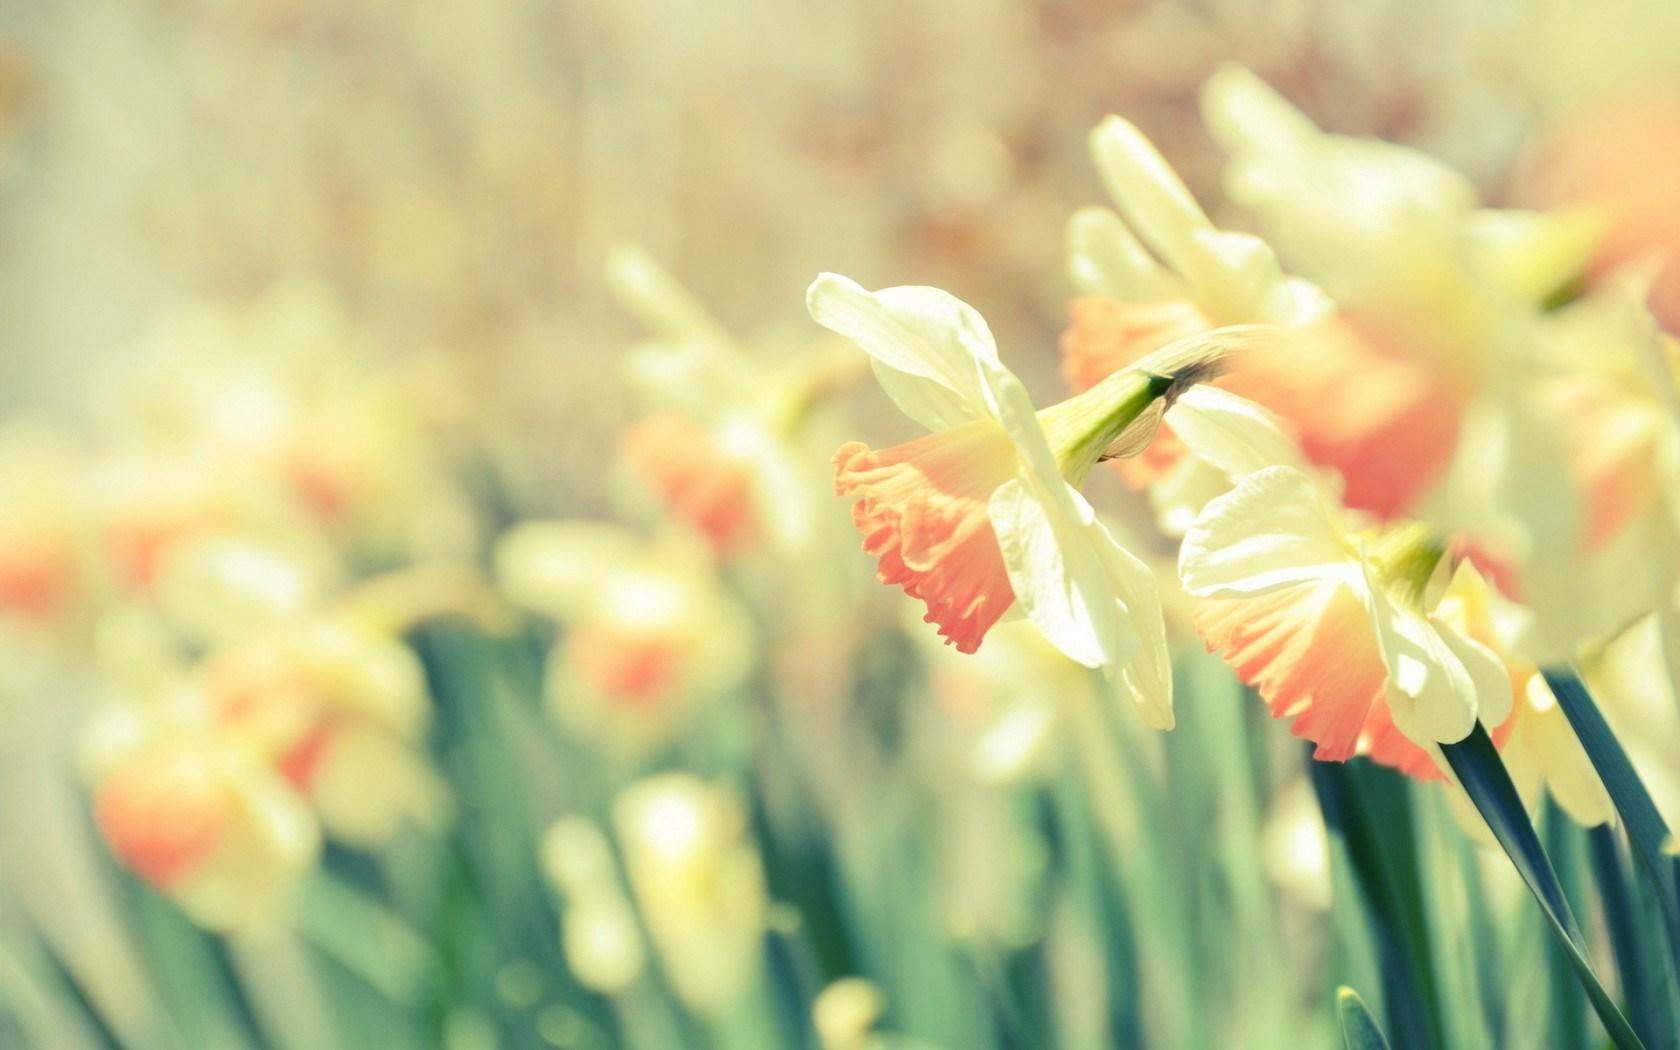 Daffodils Narcissus Flowers Hd Desktop Wallpapers 4k Hd